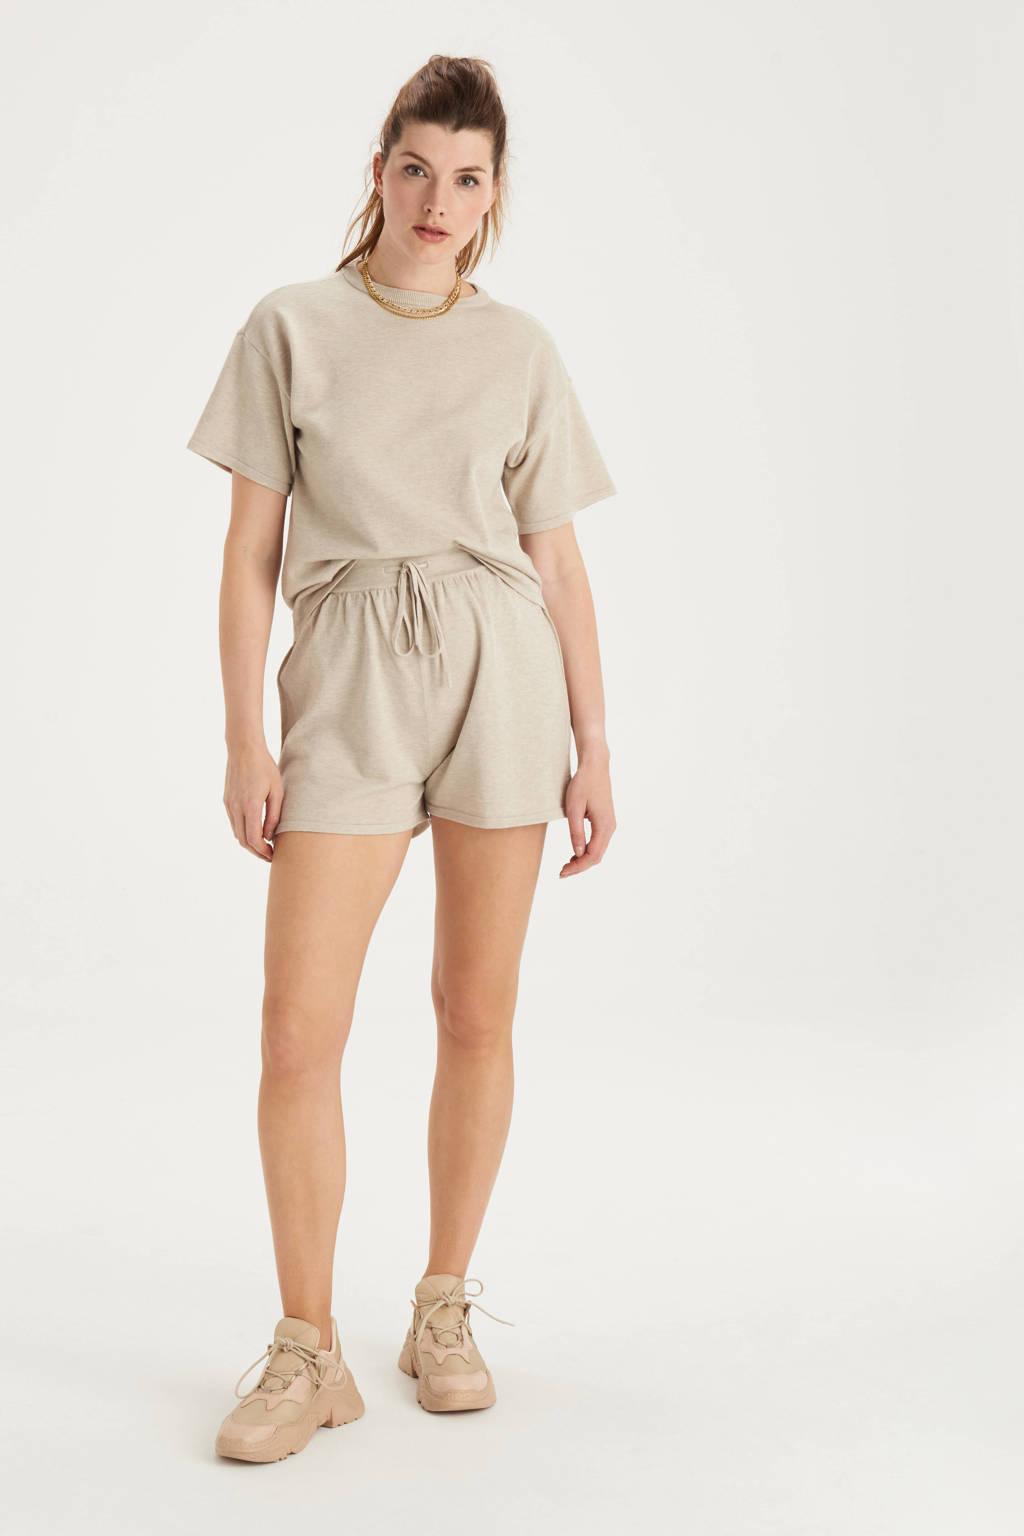 Shoeby Eksept fijngebreide T-shirt Knit zand, Zand